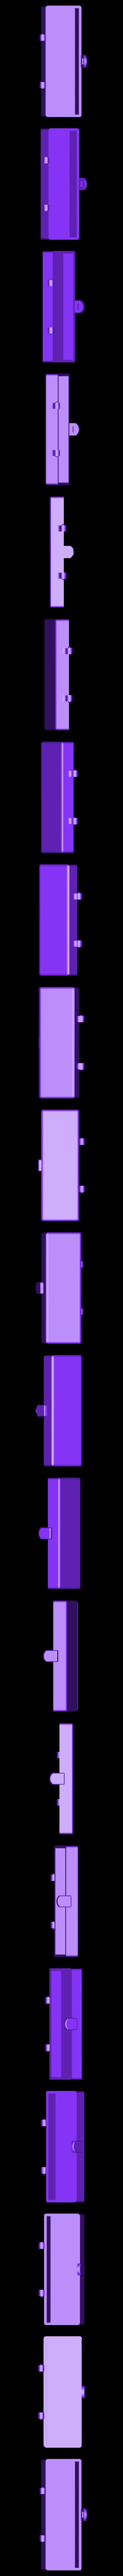 boite pour autoradio haut.stl Download STL file car radio pouch (box, kit, etc.) • 3D printable design, YOHAN_3D